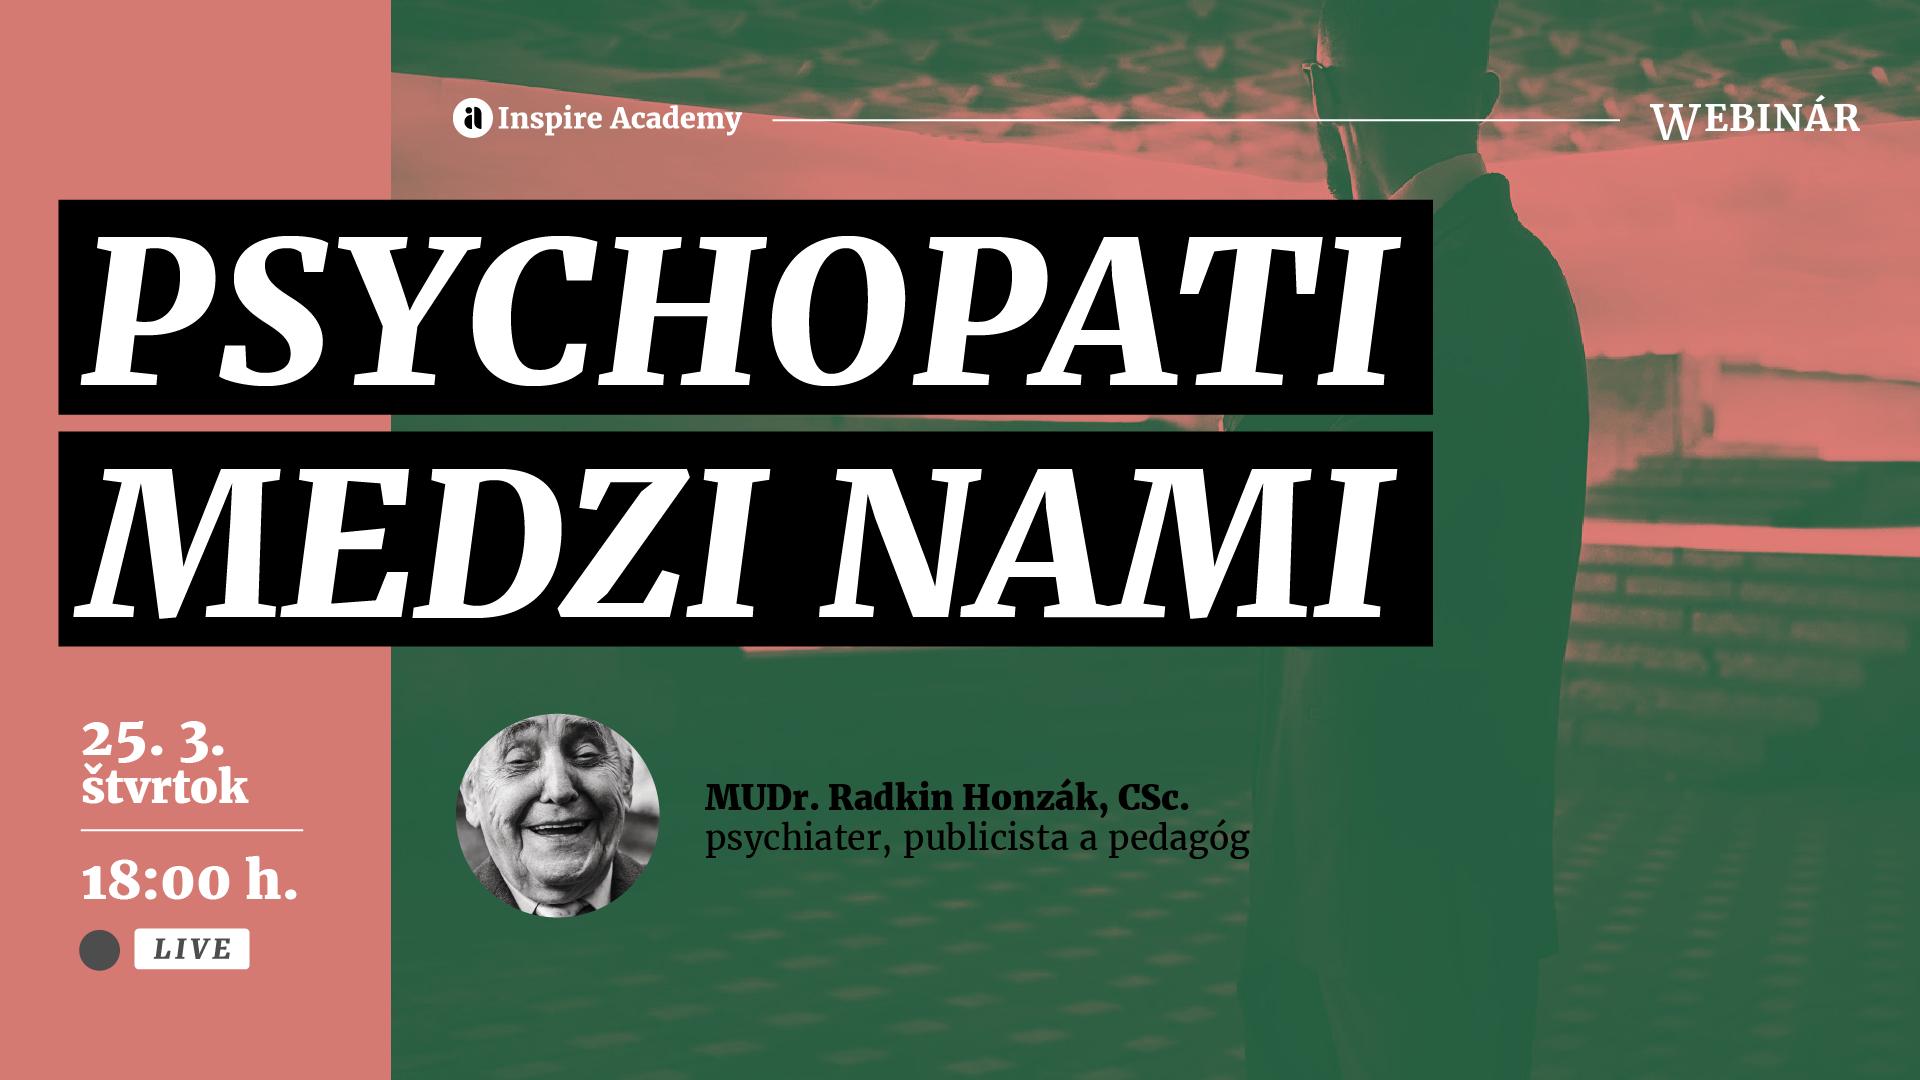 Radkin Honzák: Psychopati medzi nami